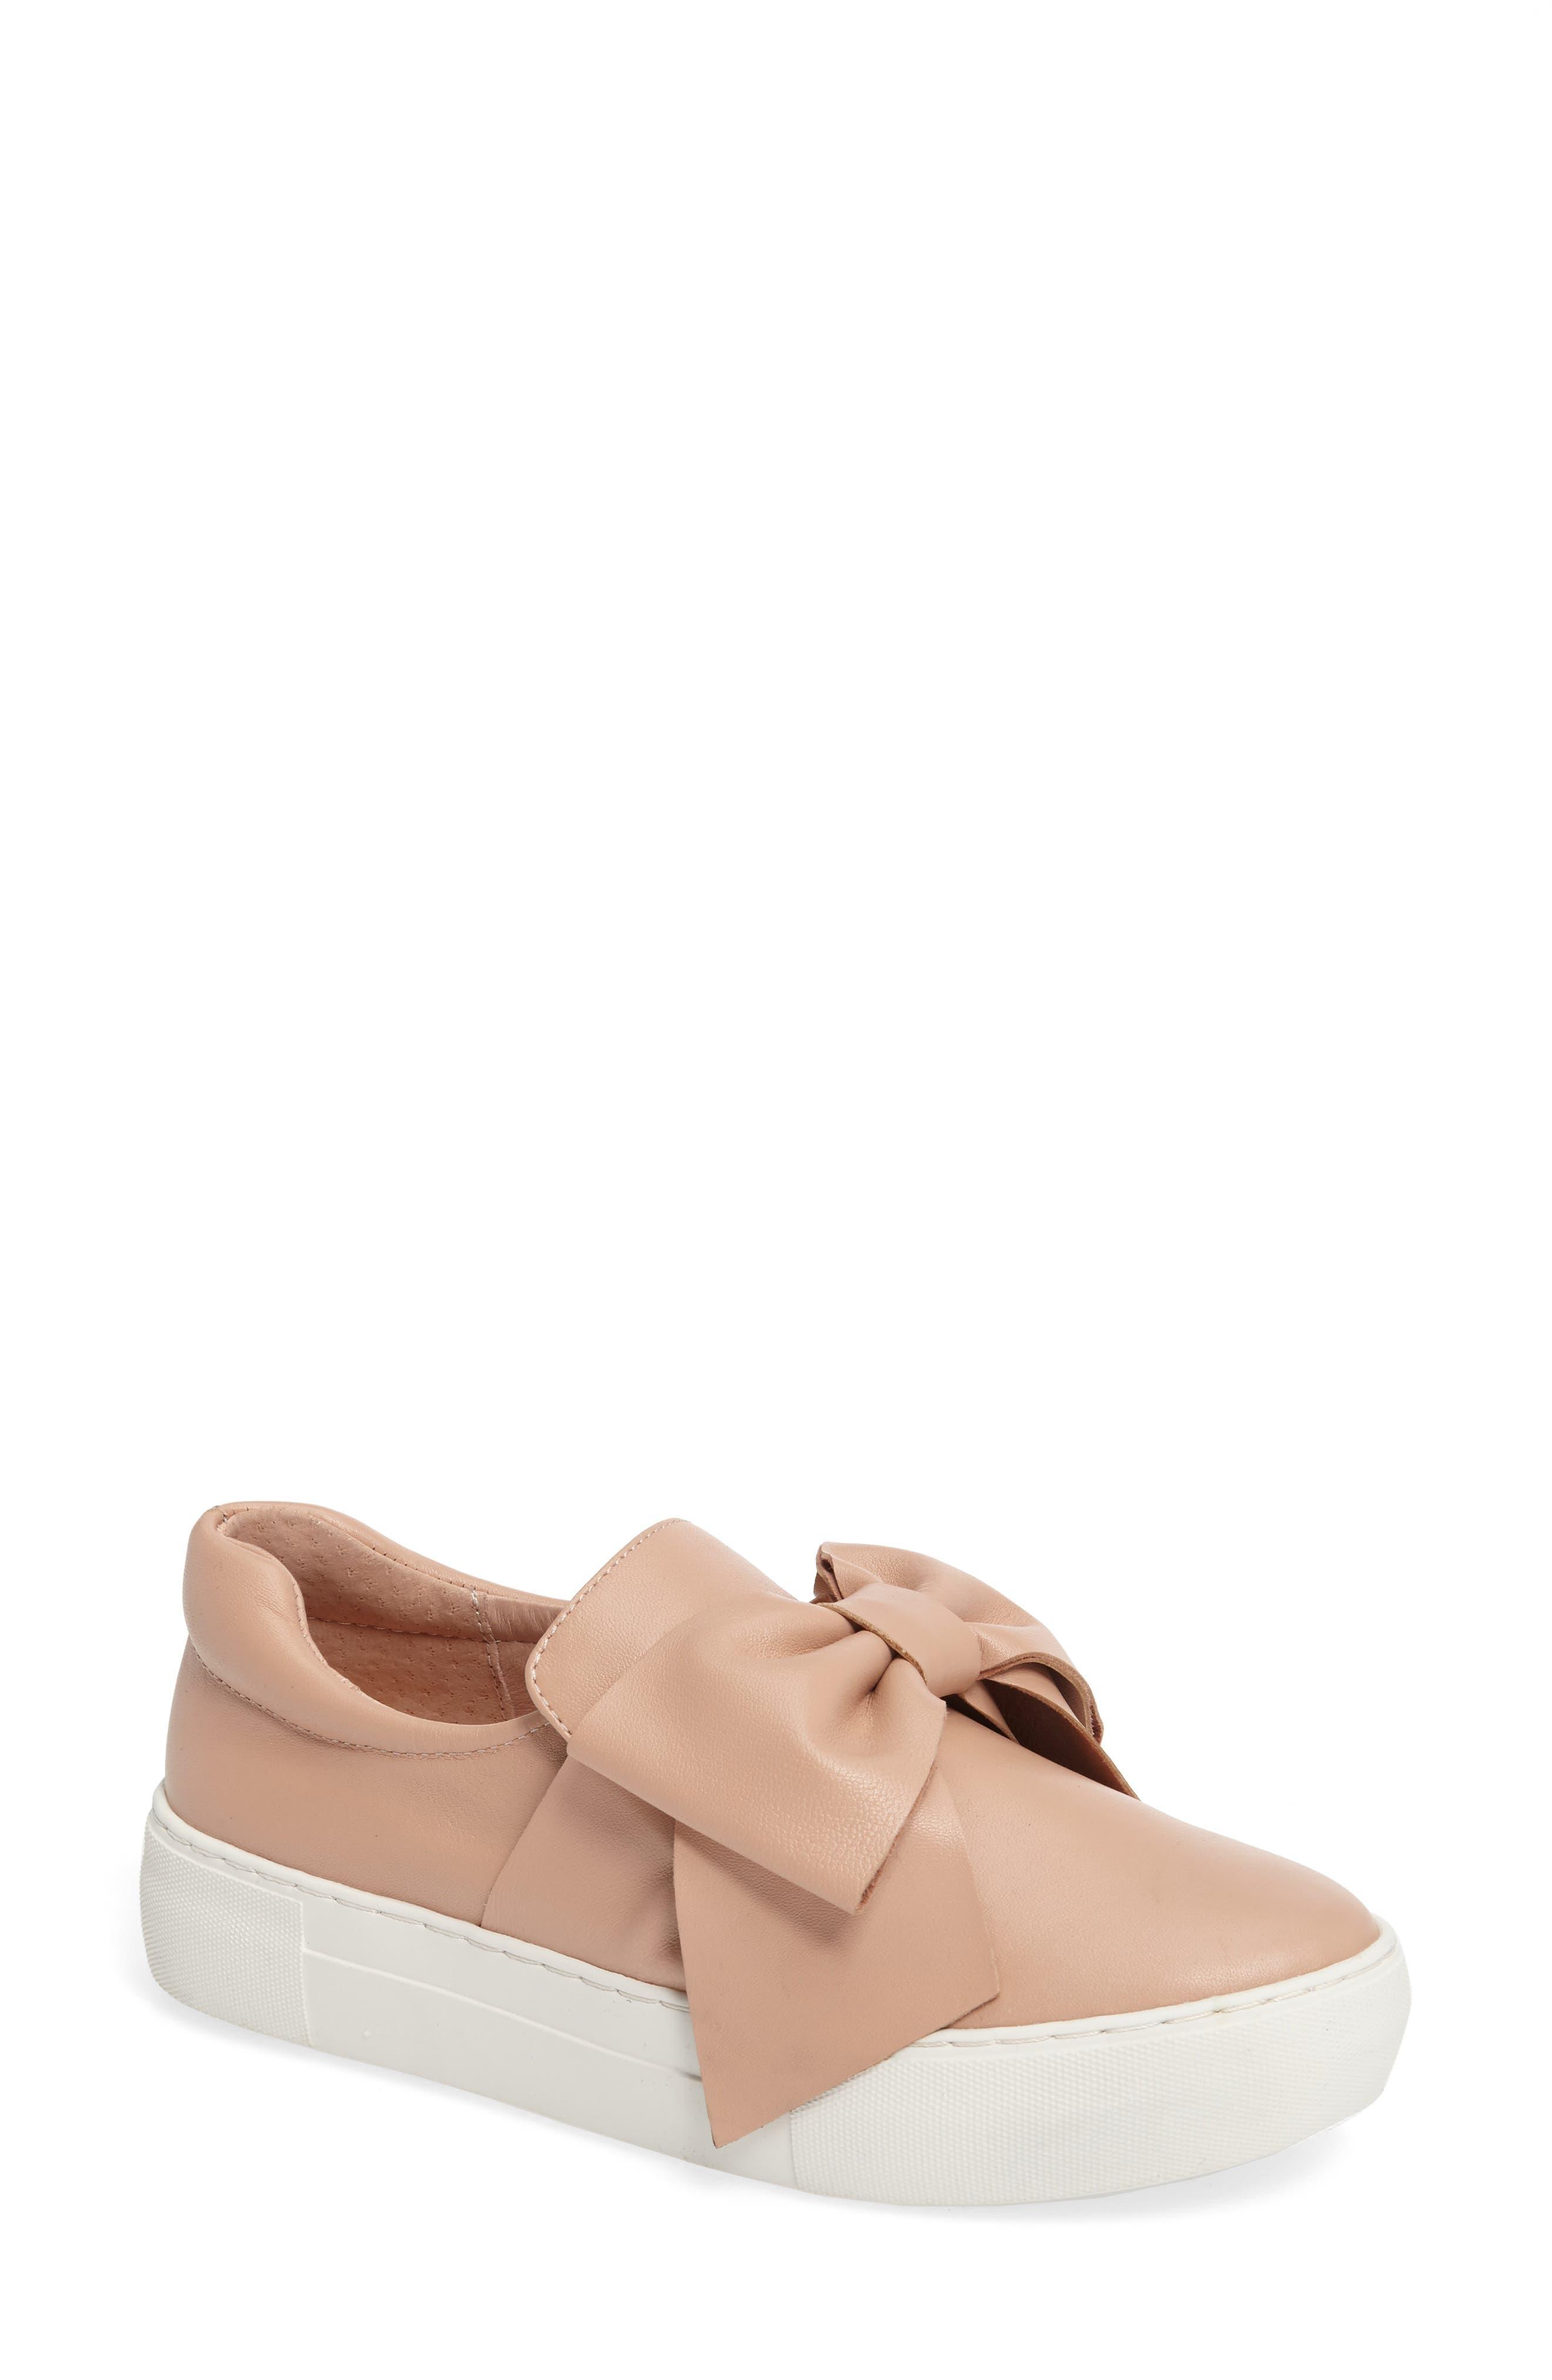 Alternate Image 1 Selected - JSlides Beauty Bow Platform Slip-On Sneaker (Women)